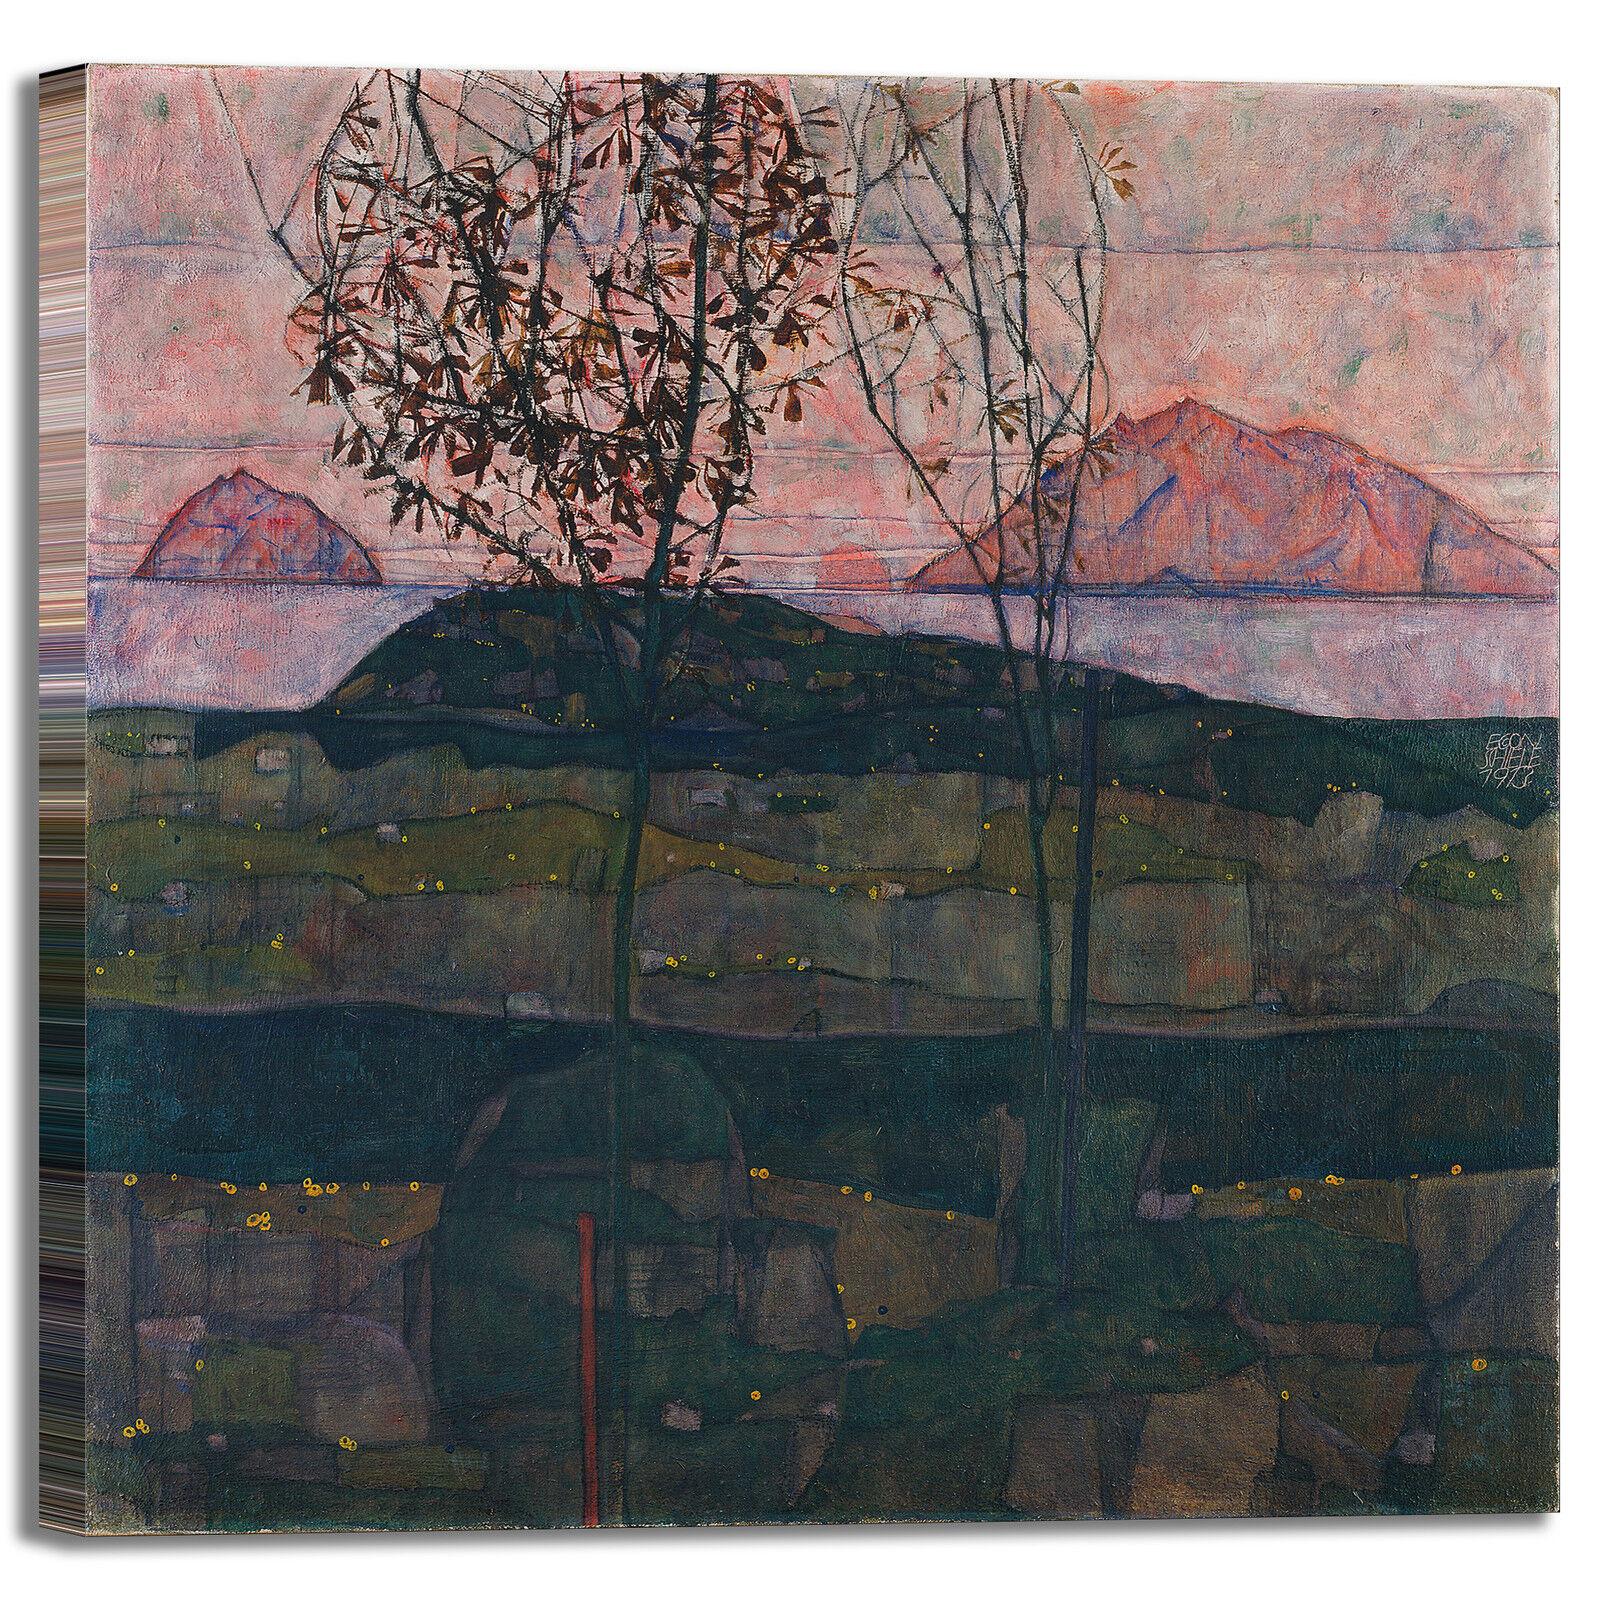 Schiele tramonto design stampa quadro stampa design tela dipinto telaio arRouge o casa 1f267a